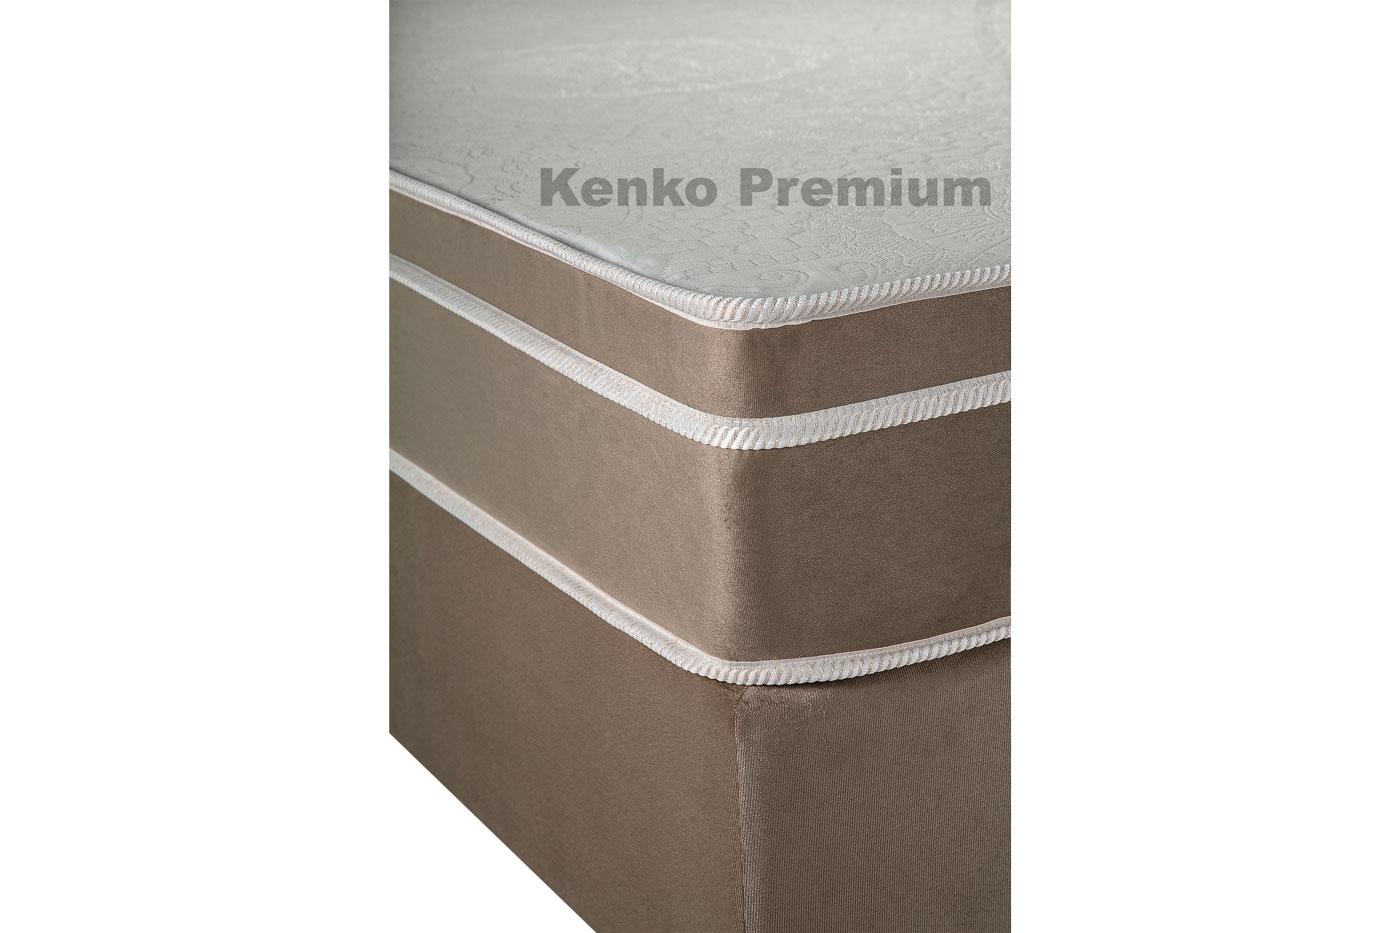 Colchão Magnético King Size Kenko Premium Standart 1,93x2,03x25cm  - Kenko Premium Colchões